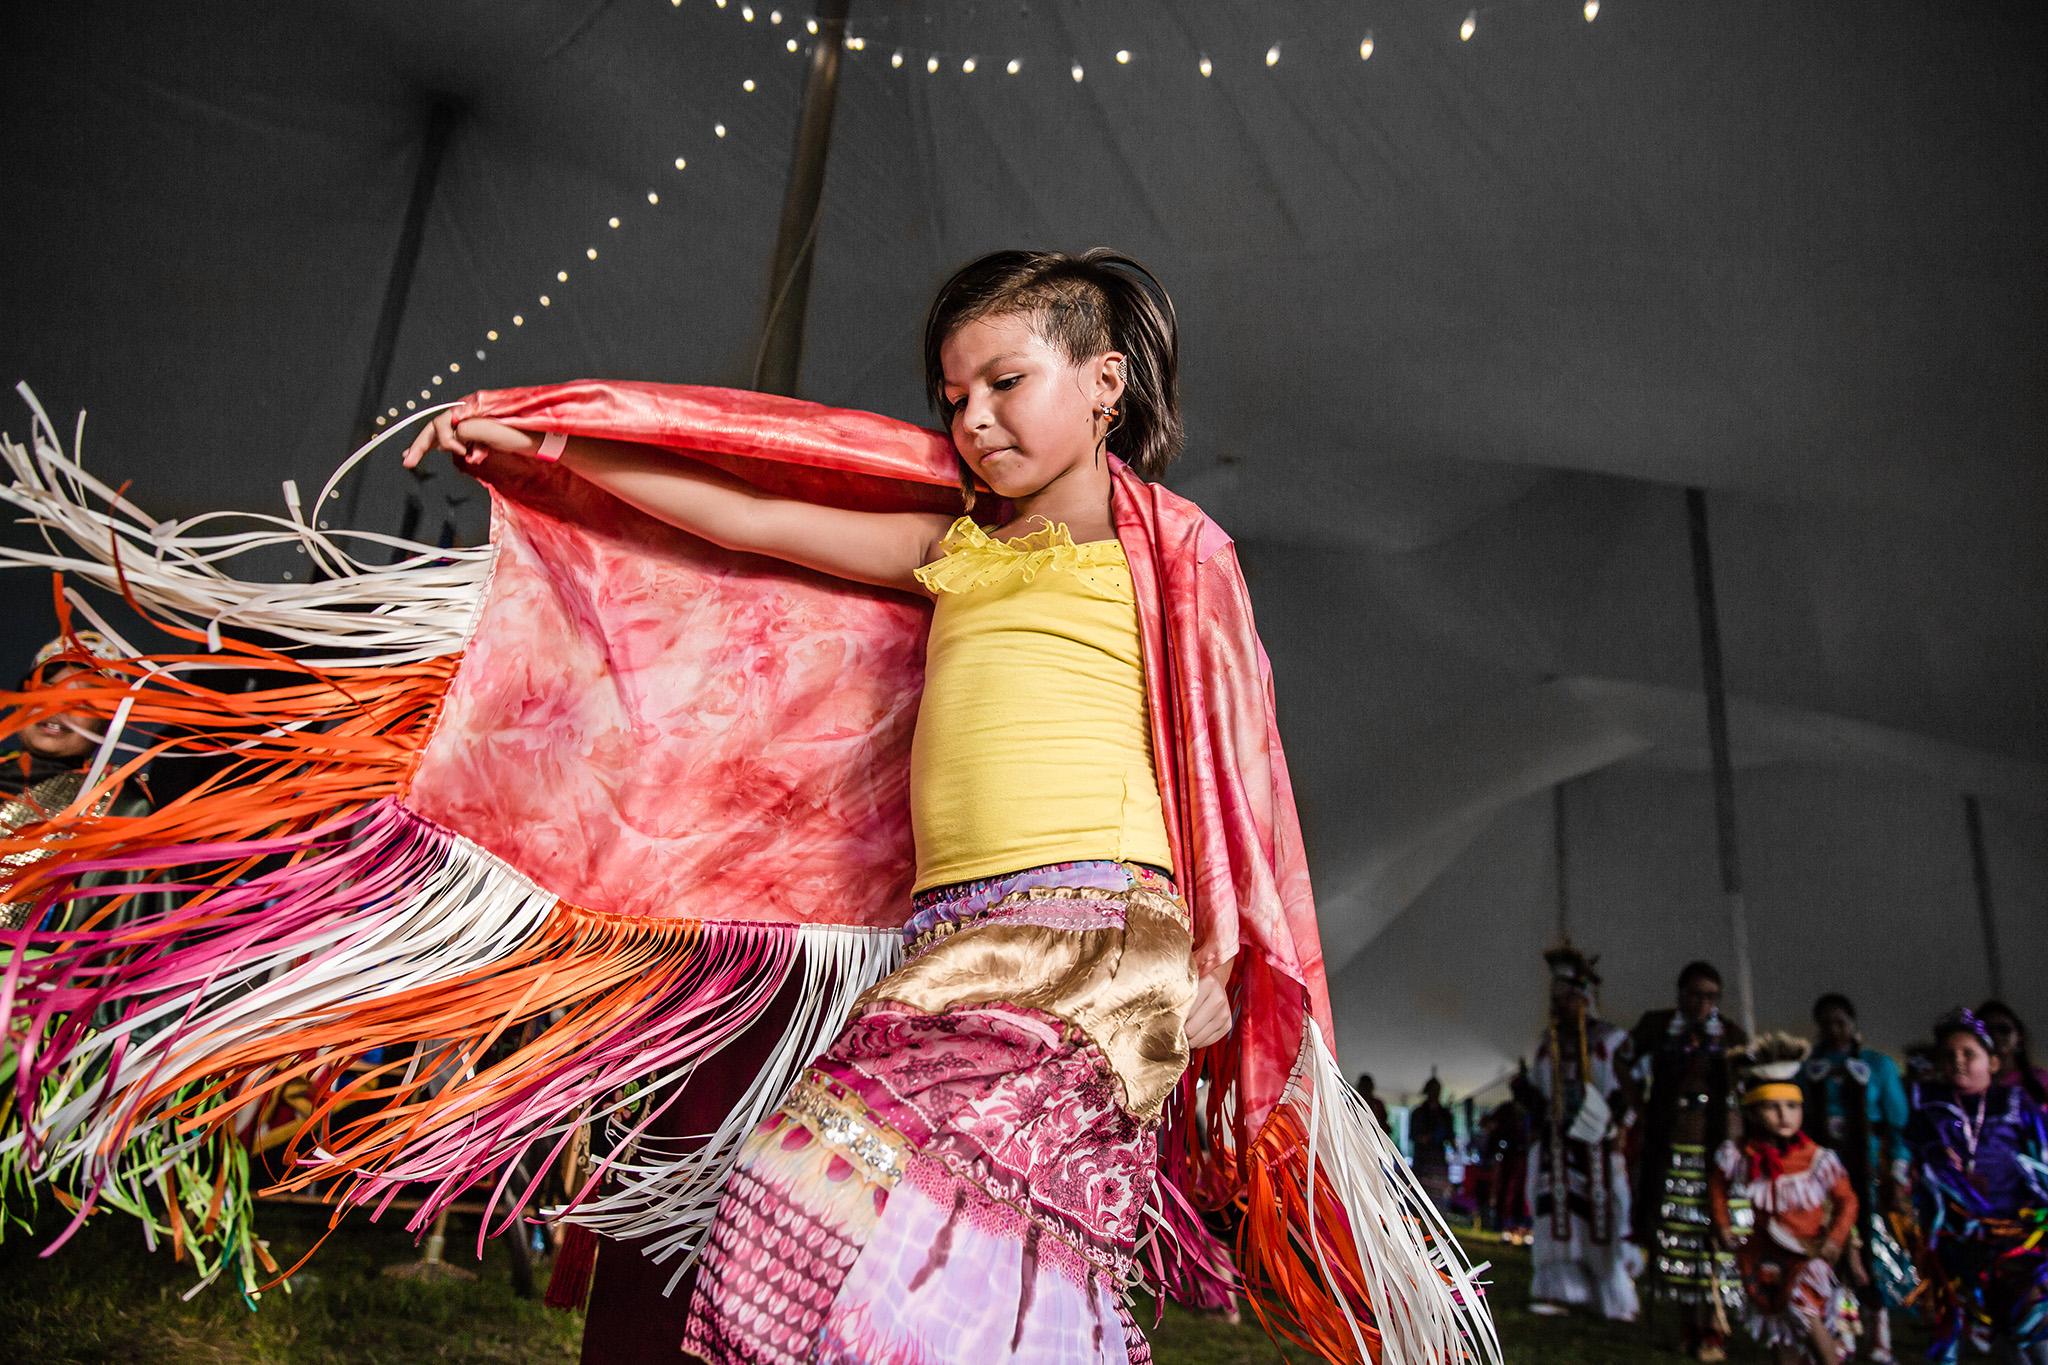 Native American suku puoli videoita Iso koko munaa